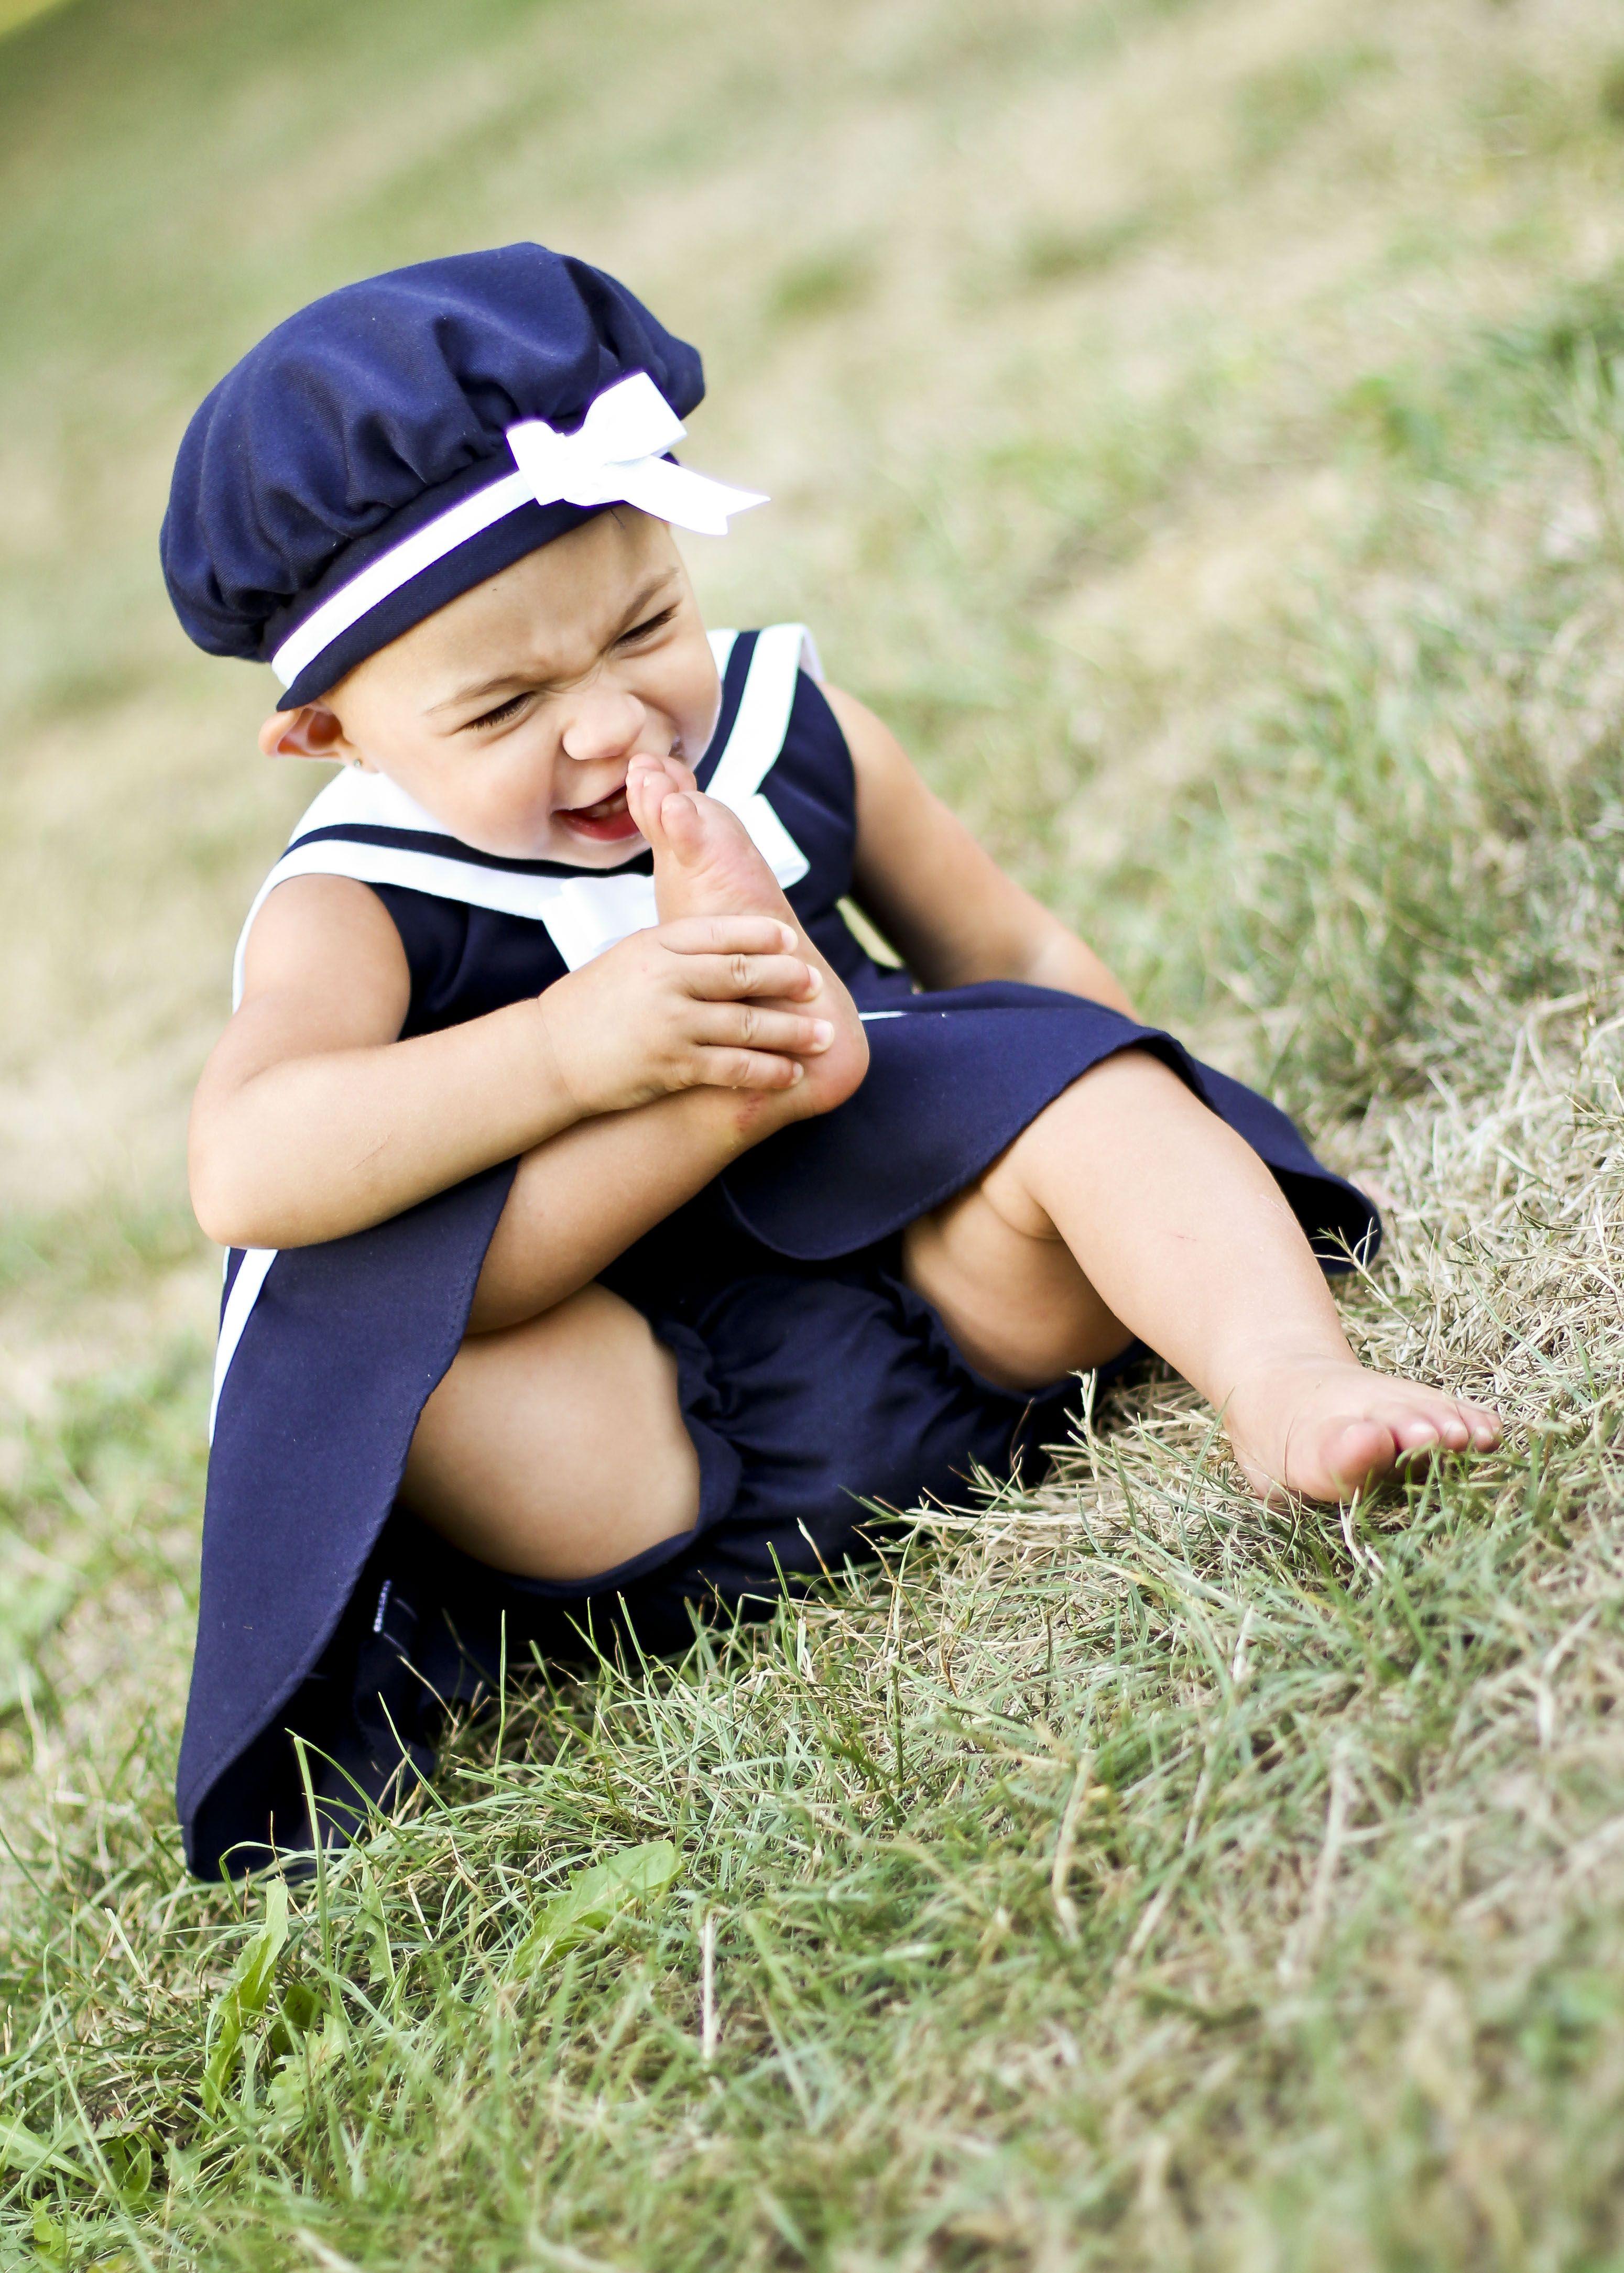 Stinky feet | Kid poses, Stinky feet, Poses